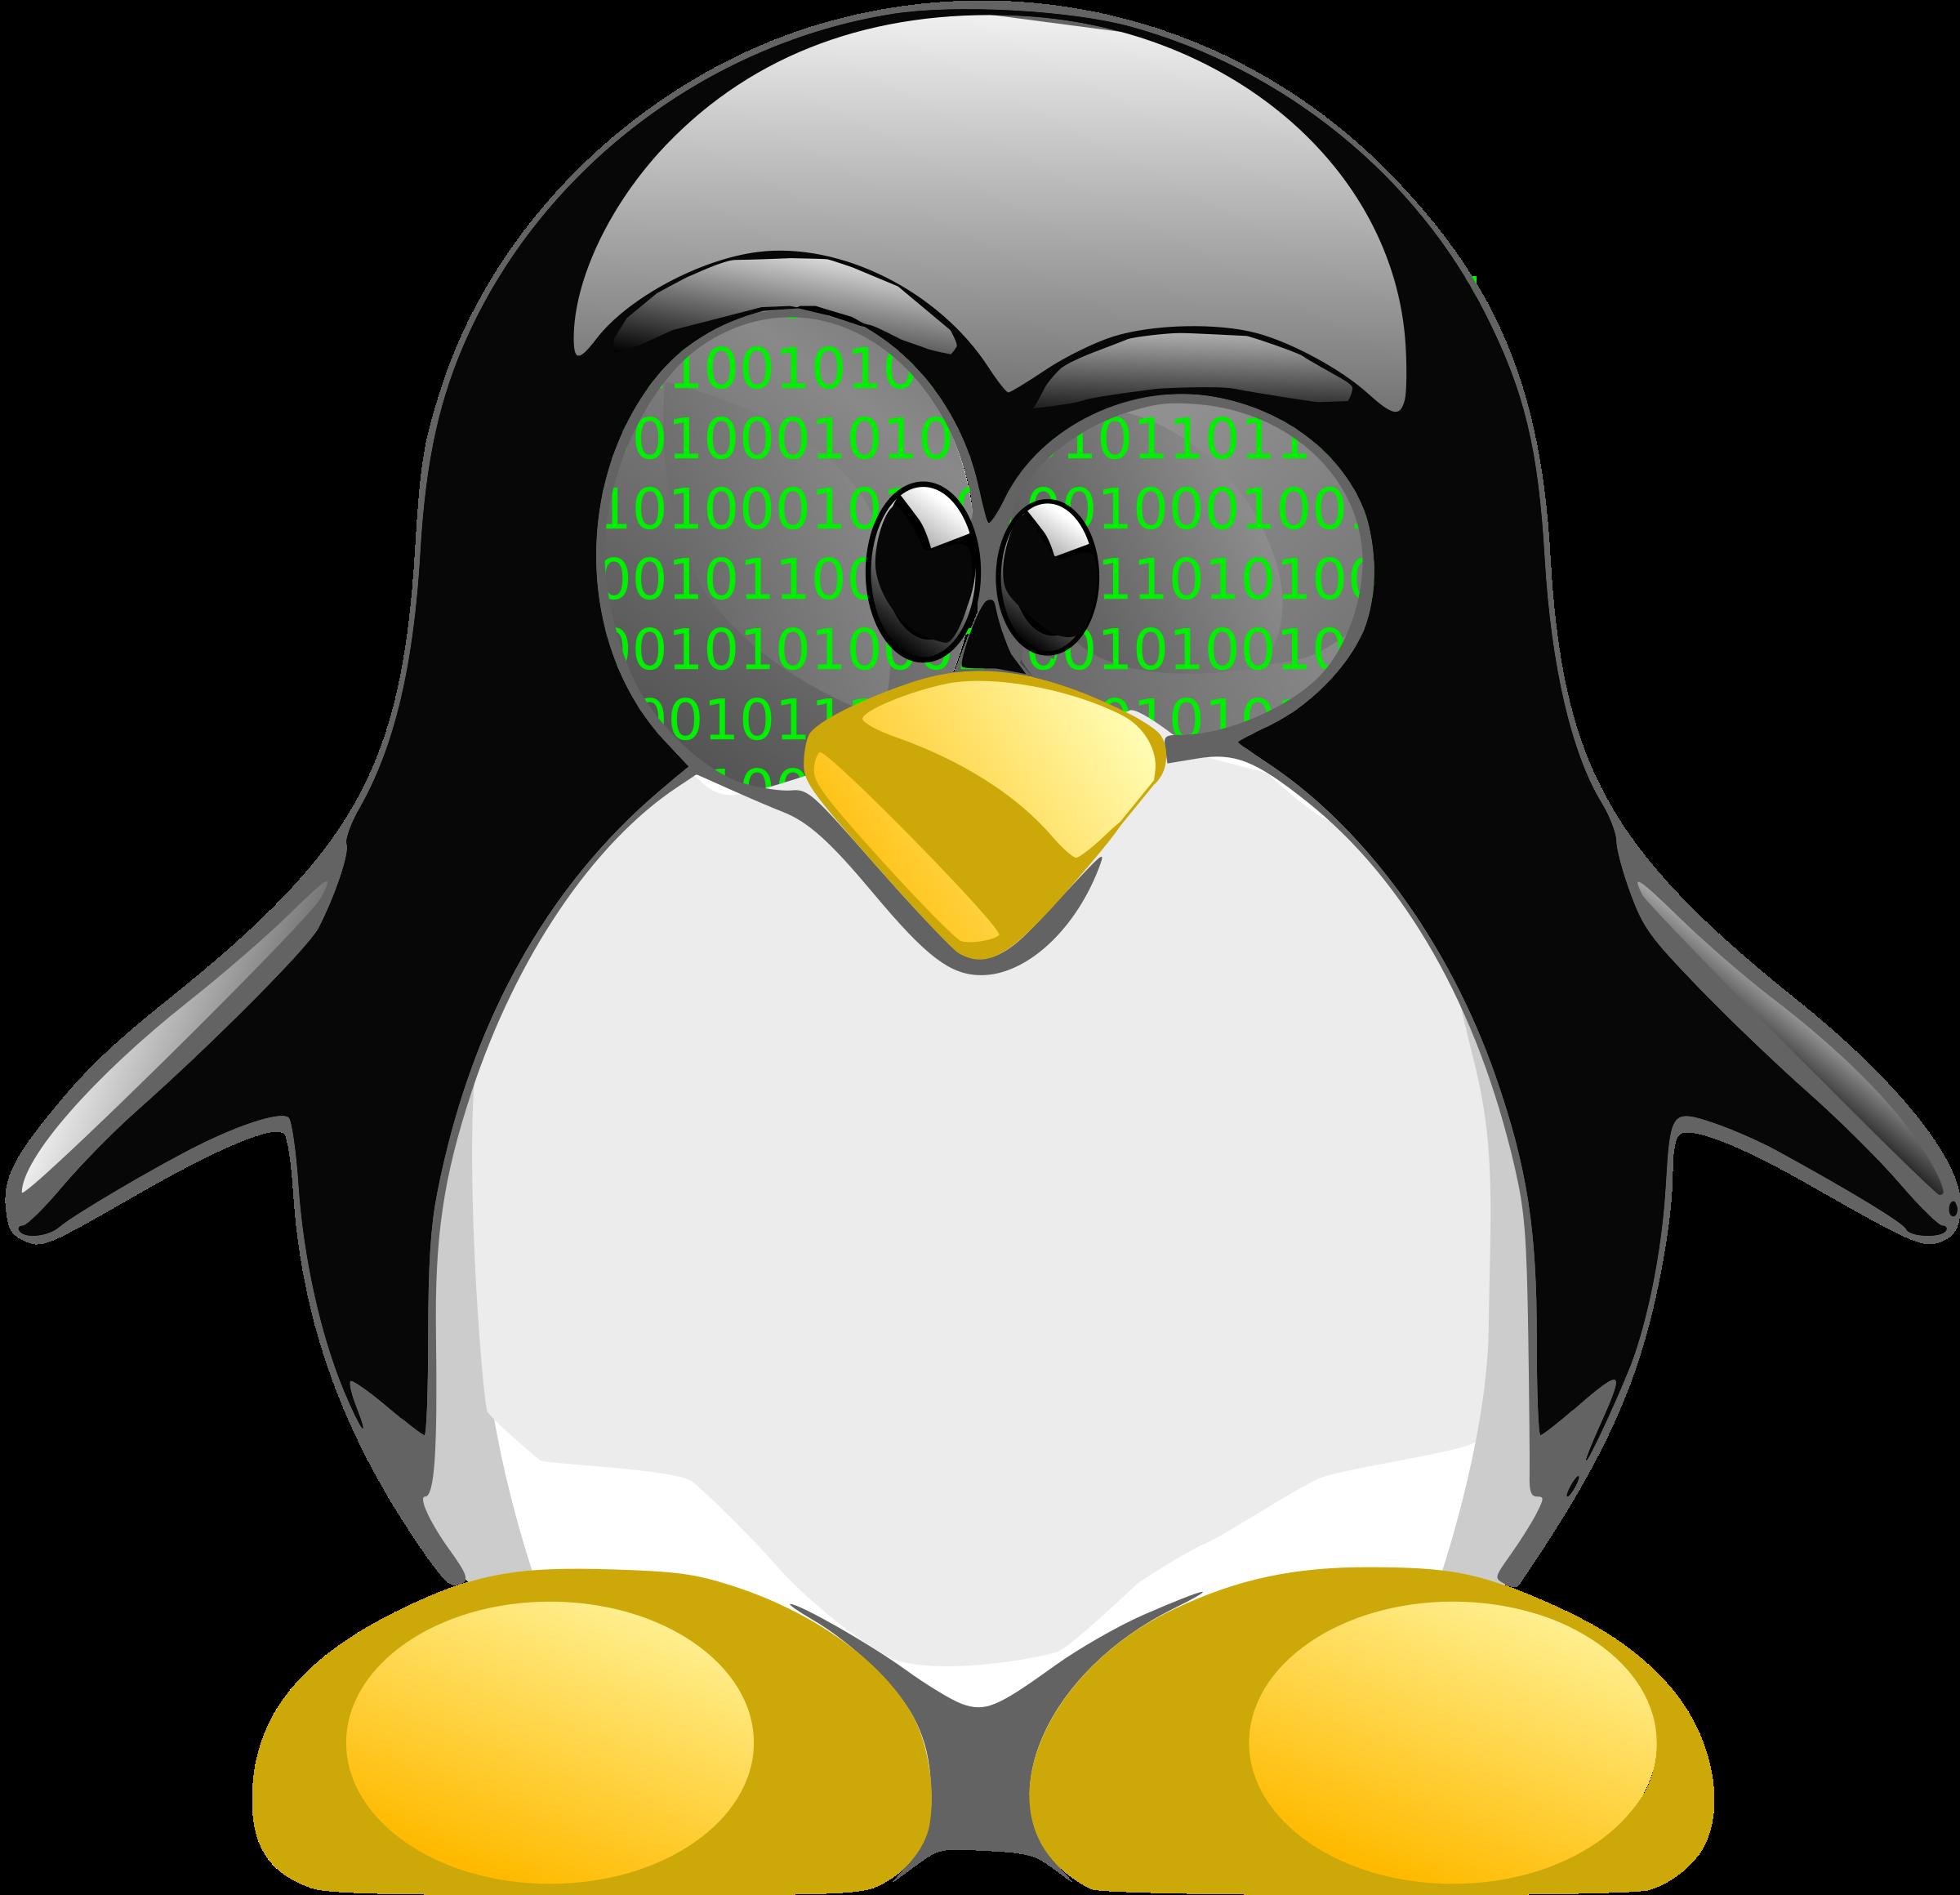 Linux mint clipart png royalty free Linux mint clipart - ClipartFest png royalty free